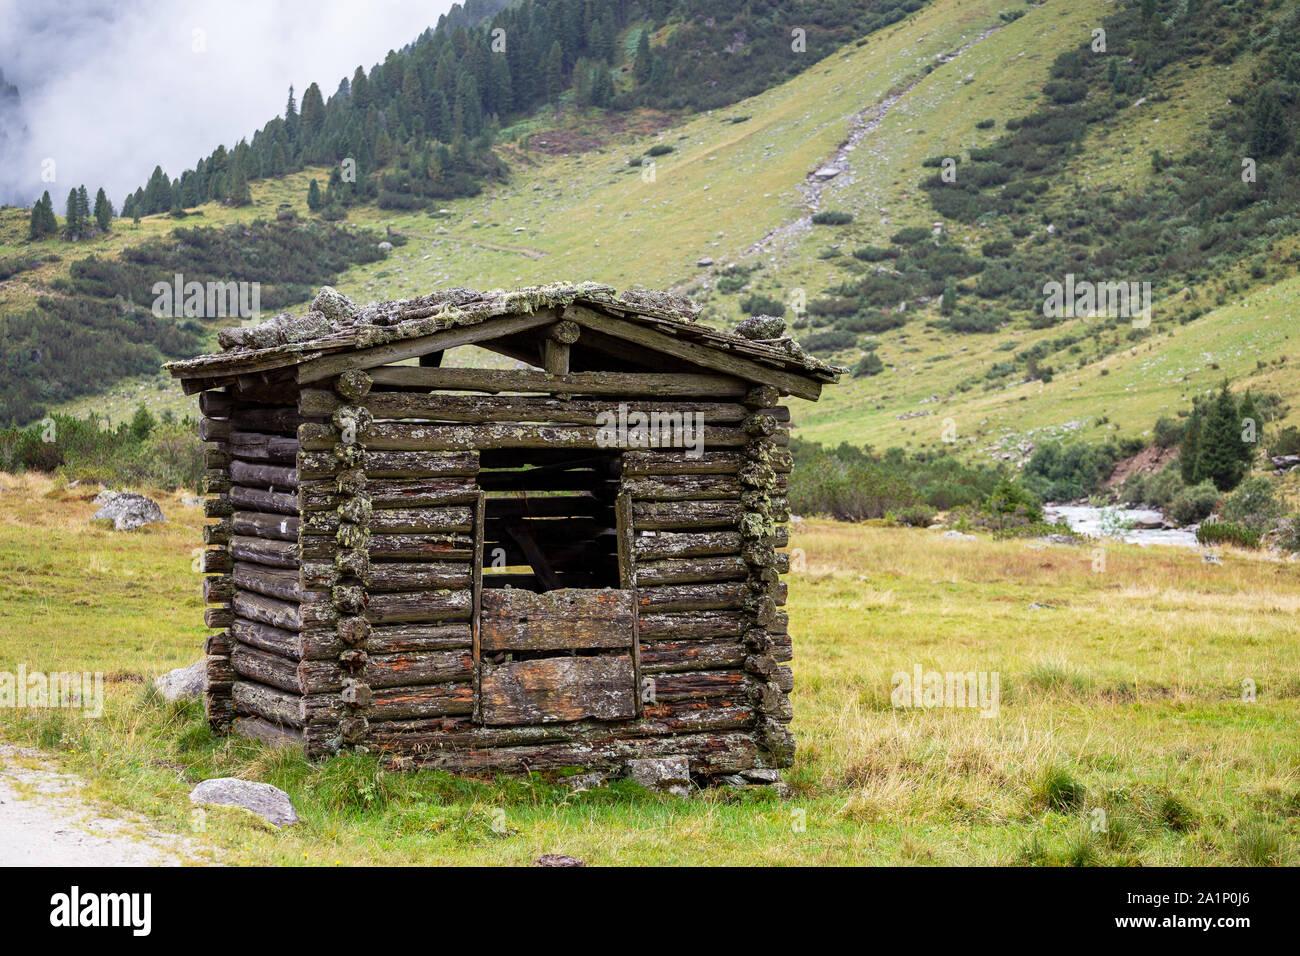 Wooden chalet. Krimmler Achen valley. Hohe Tauern National Park. Austrian Alps. Europe. Stock Photo